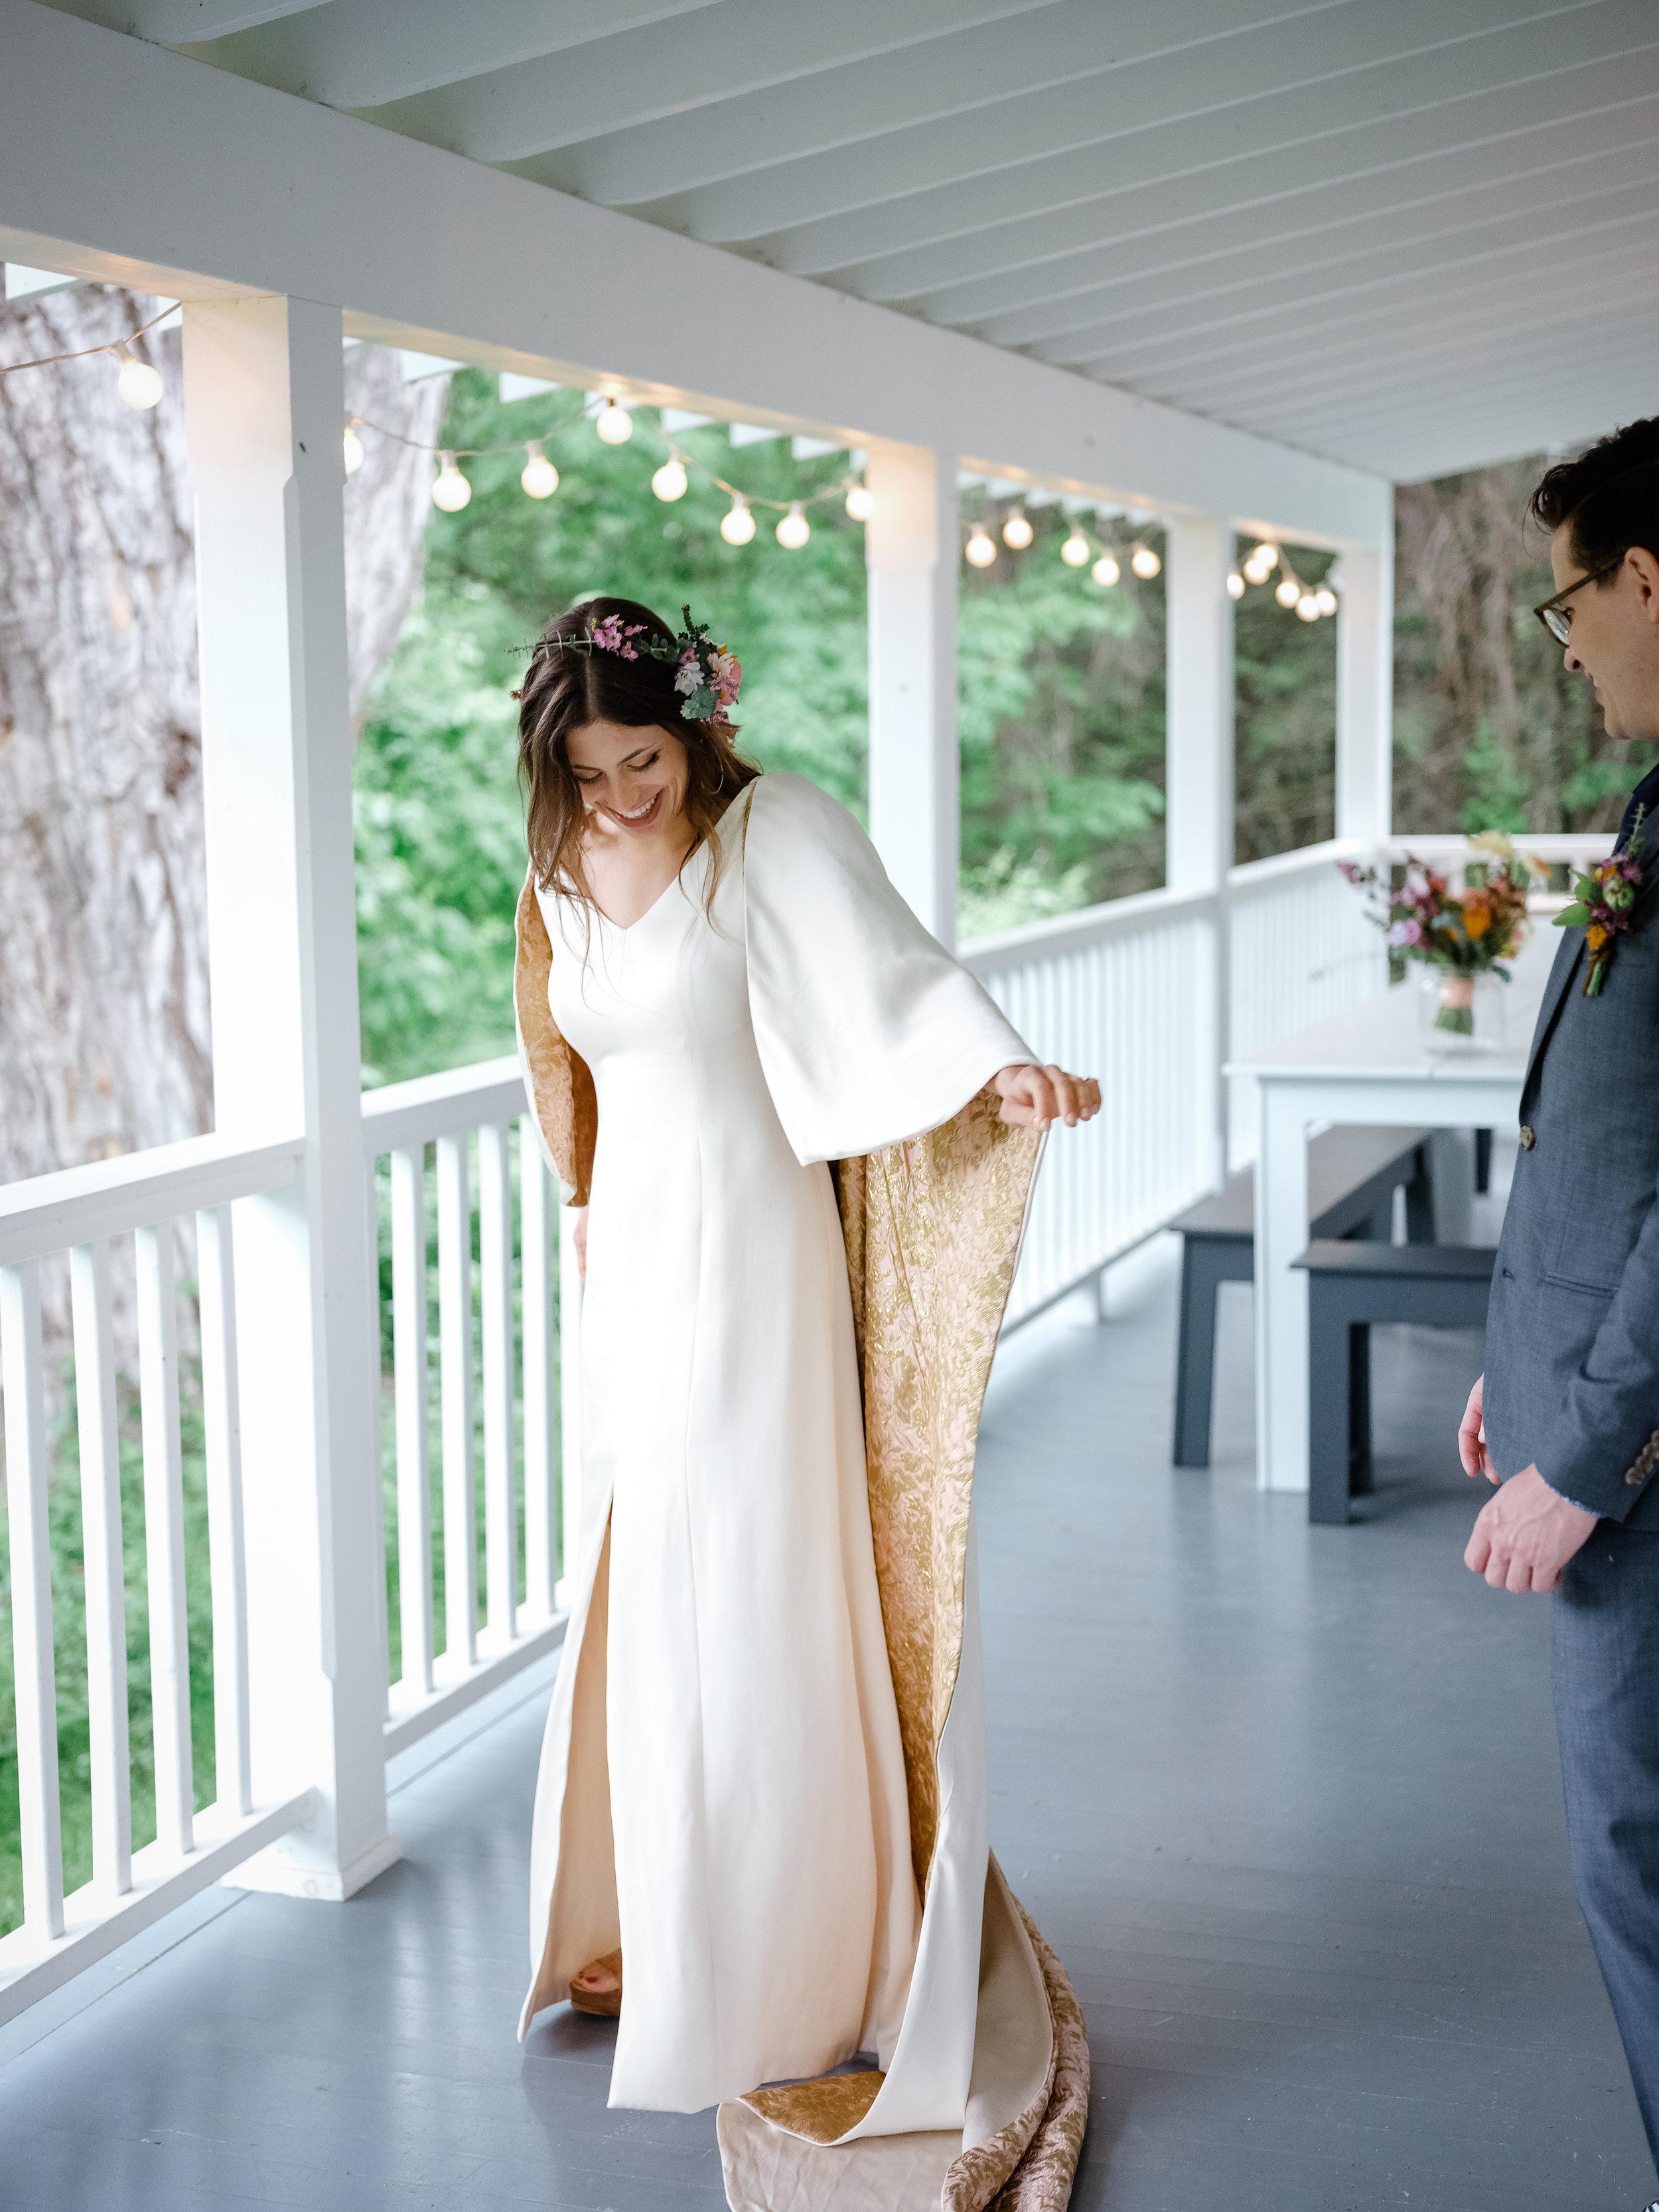 WSPCo-05272018-Aliya-Eric-Wedding-Sneak-Peek-7.jpg